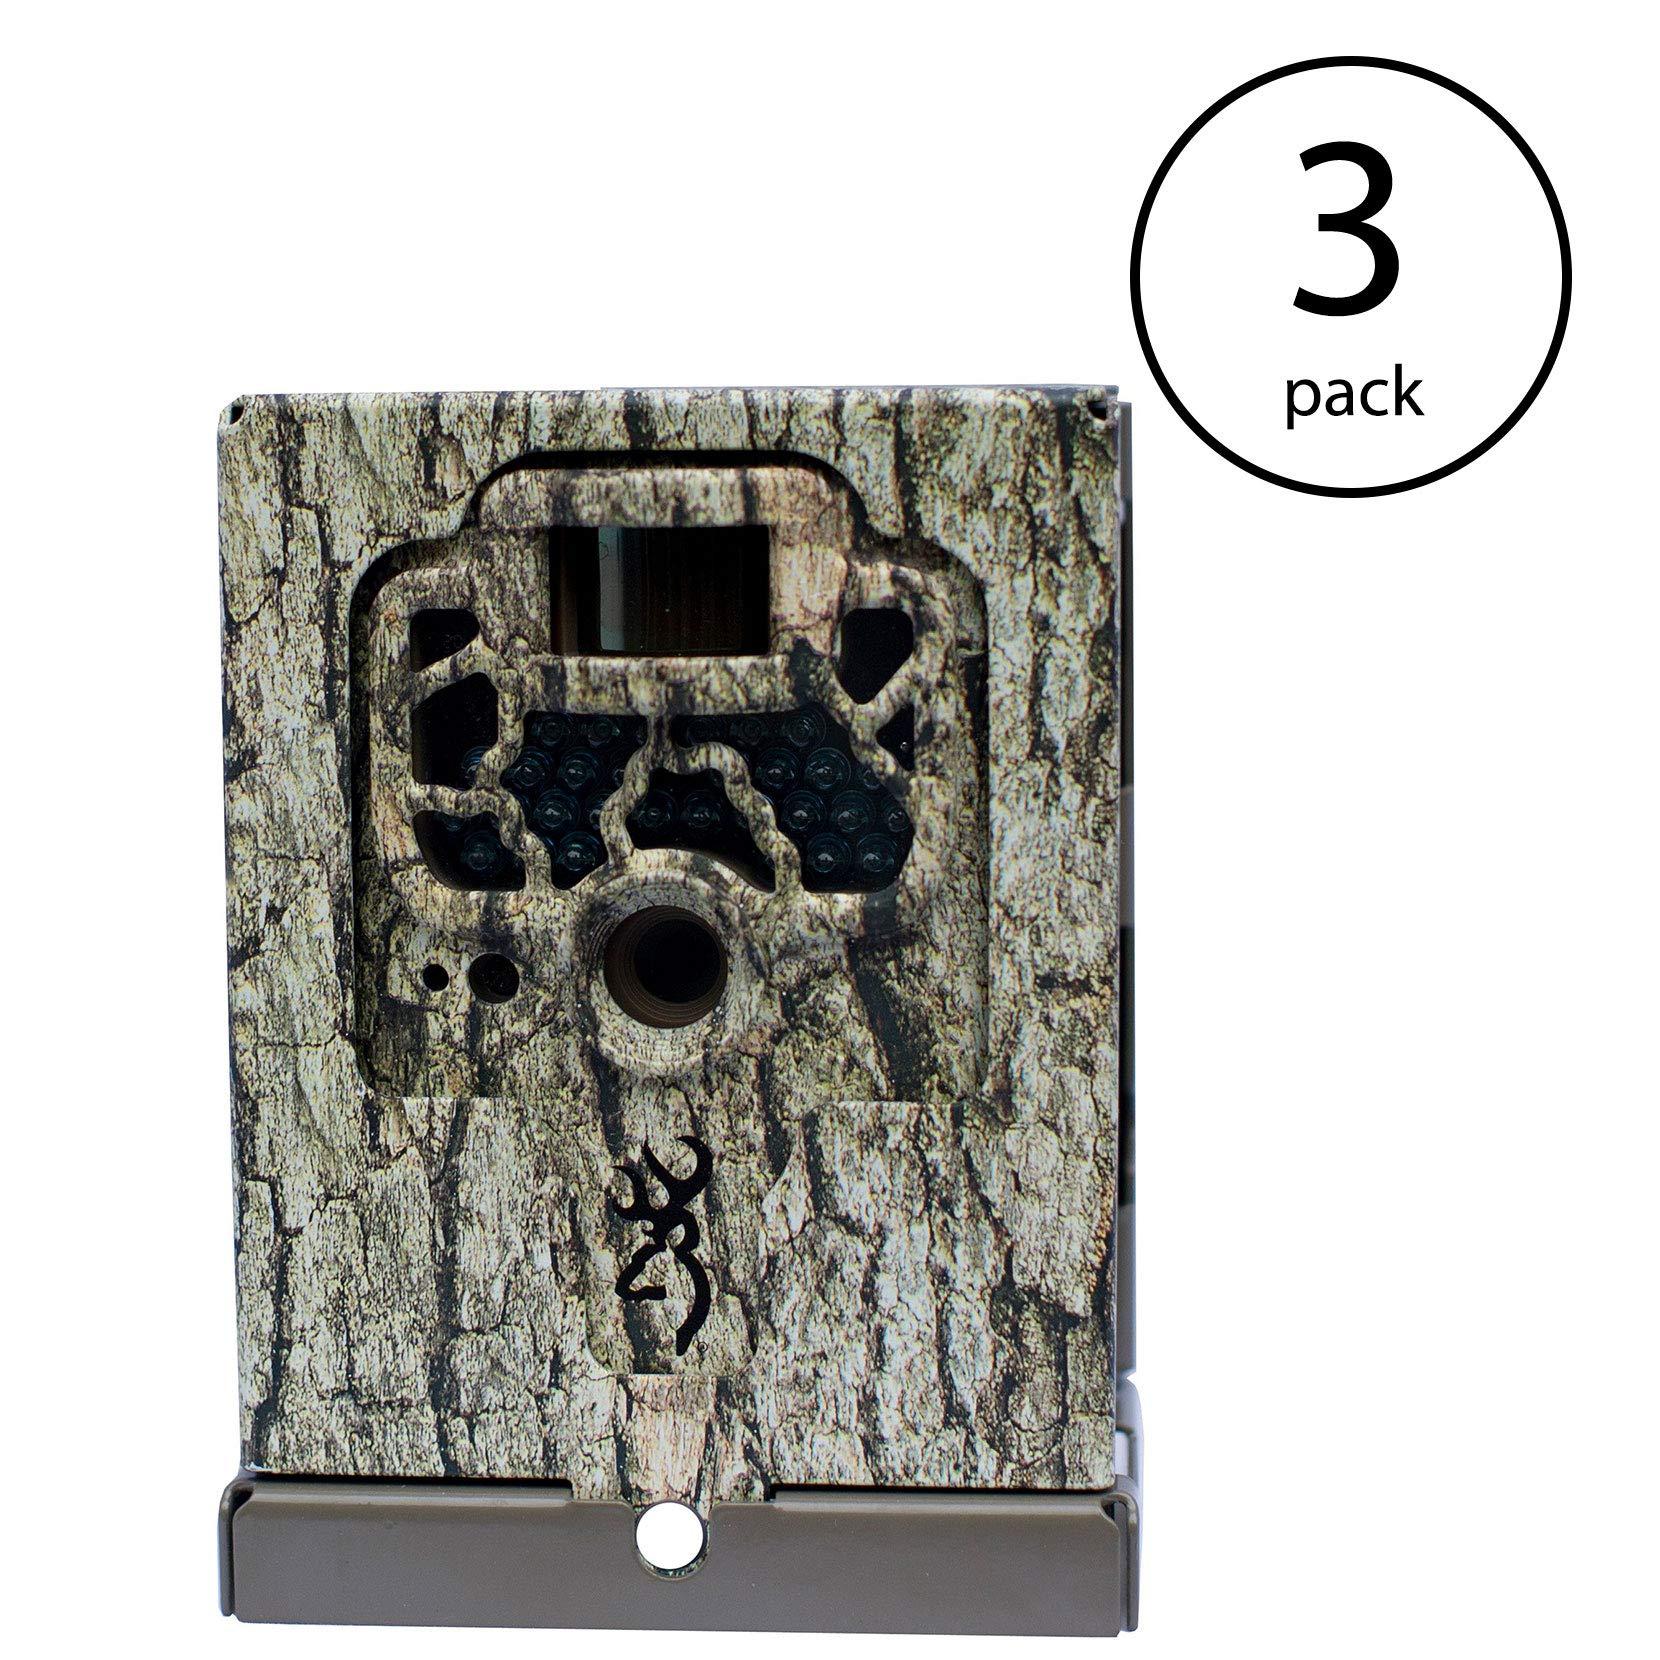 Browning Trail Cameras Locking Security Box Case for Game Cameras, Camo   BTC-SB (3 Pack)